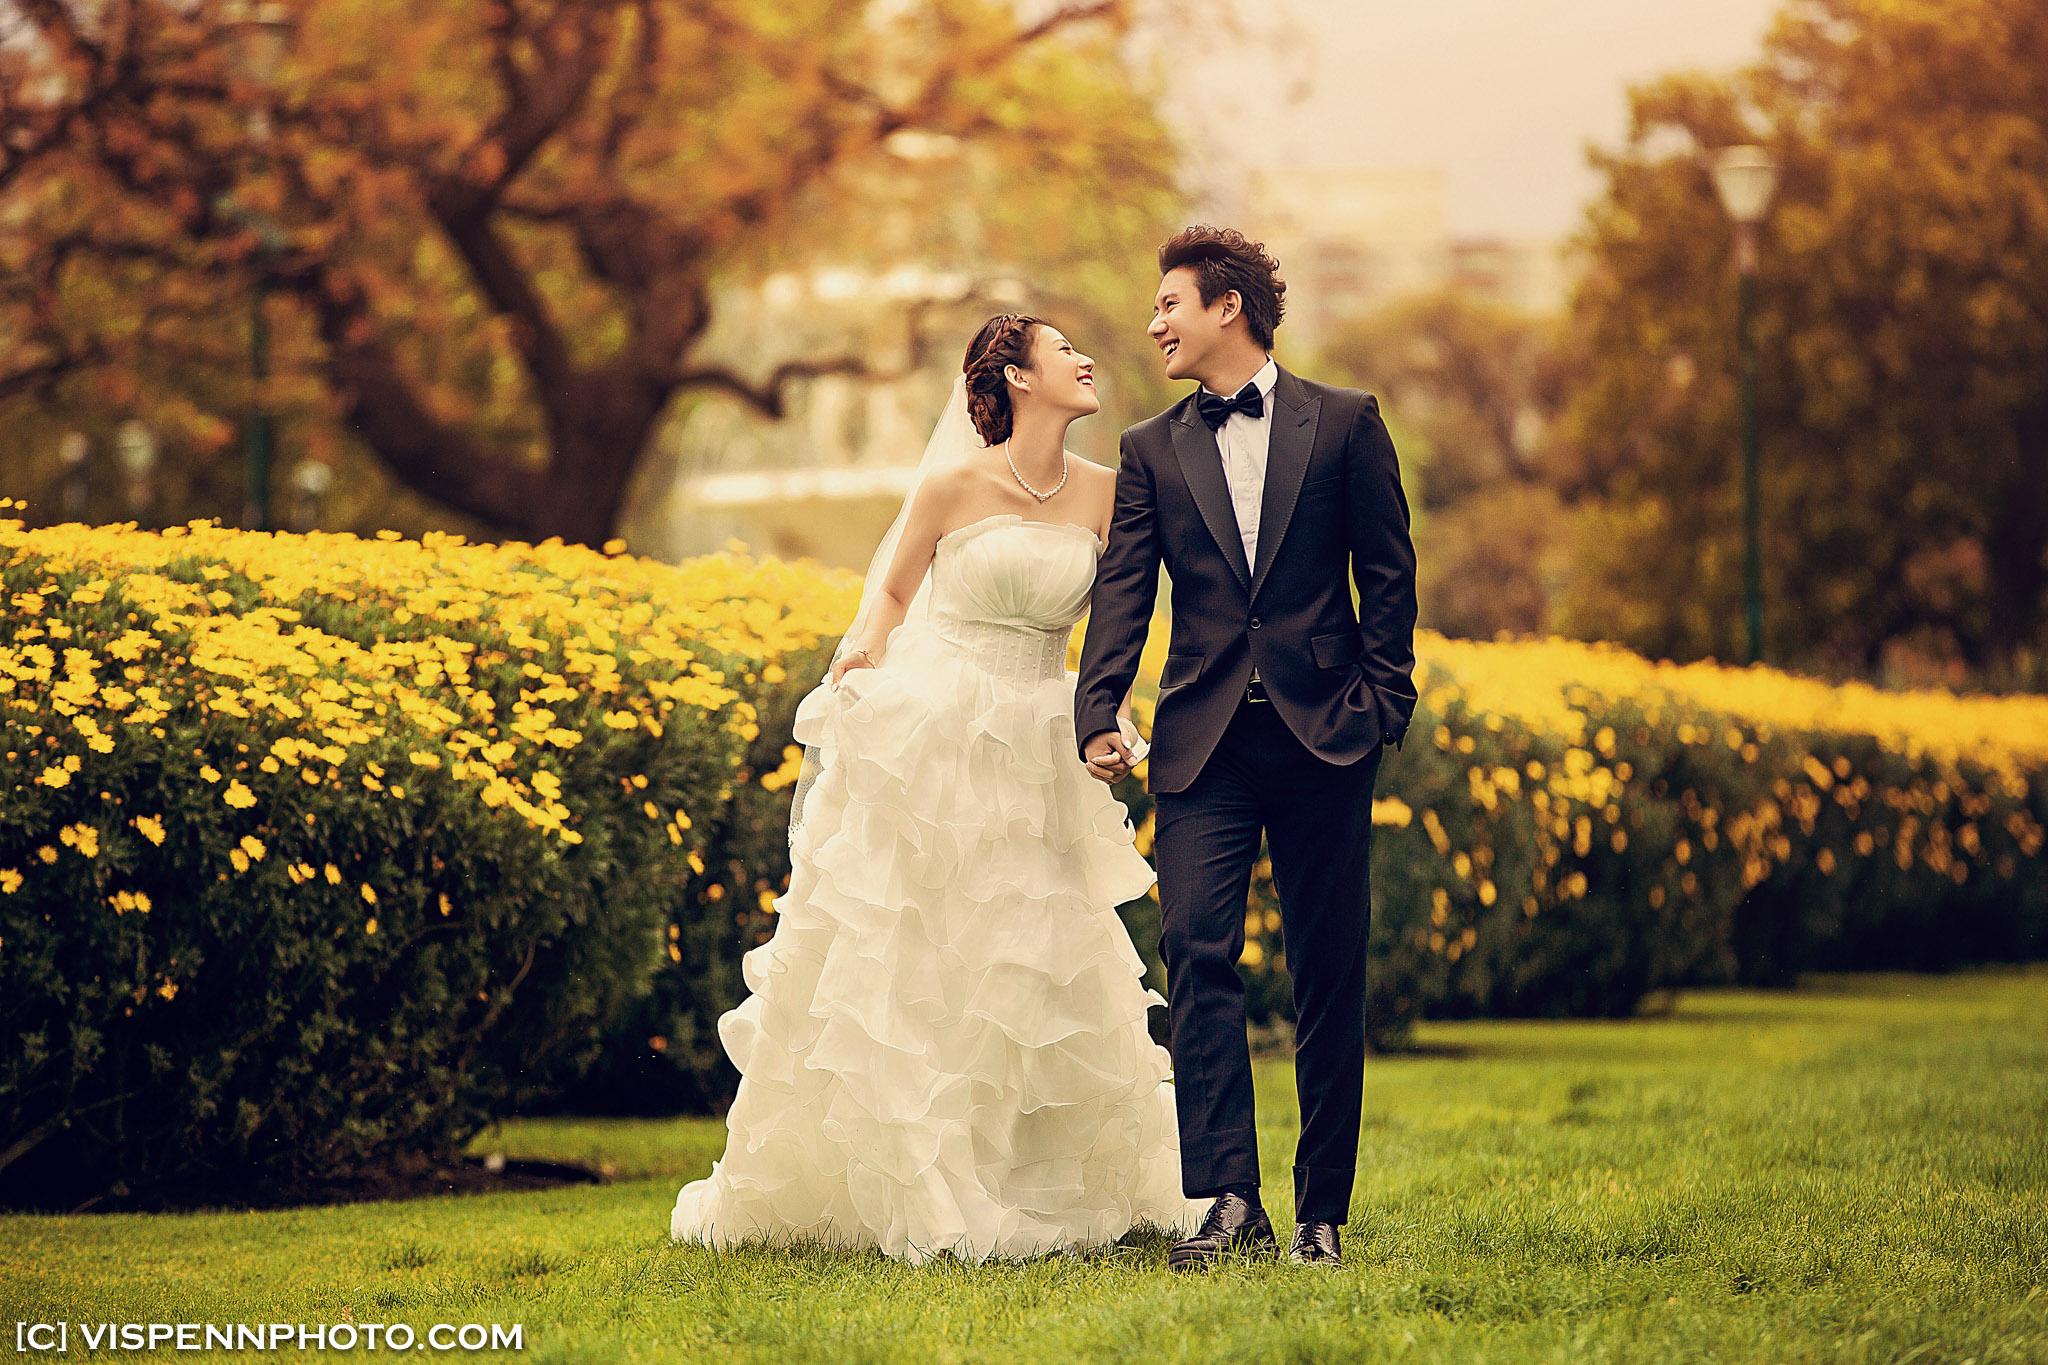 PRE WEDDING Photography Melbourne 5D3 3297